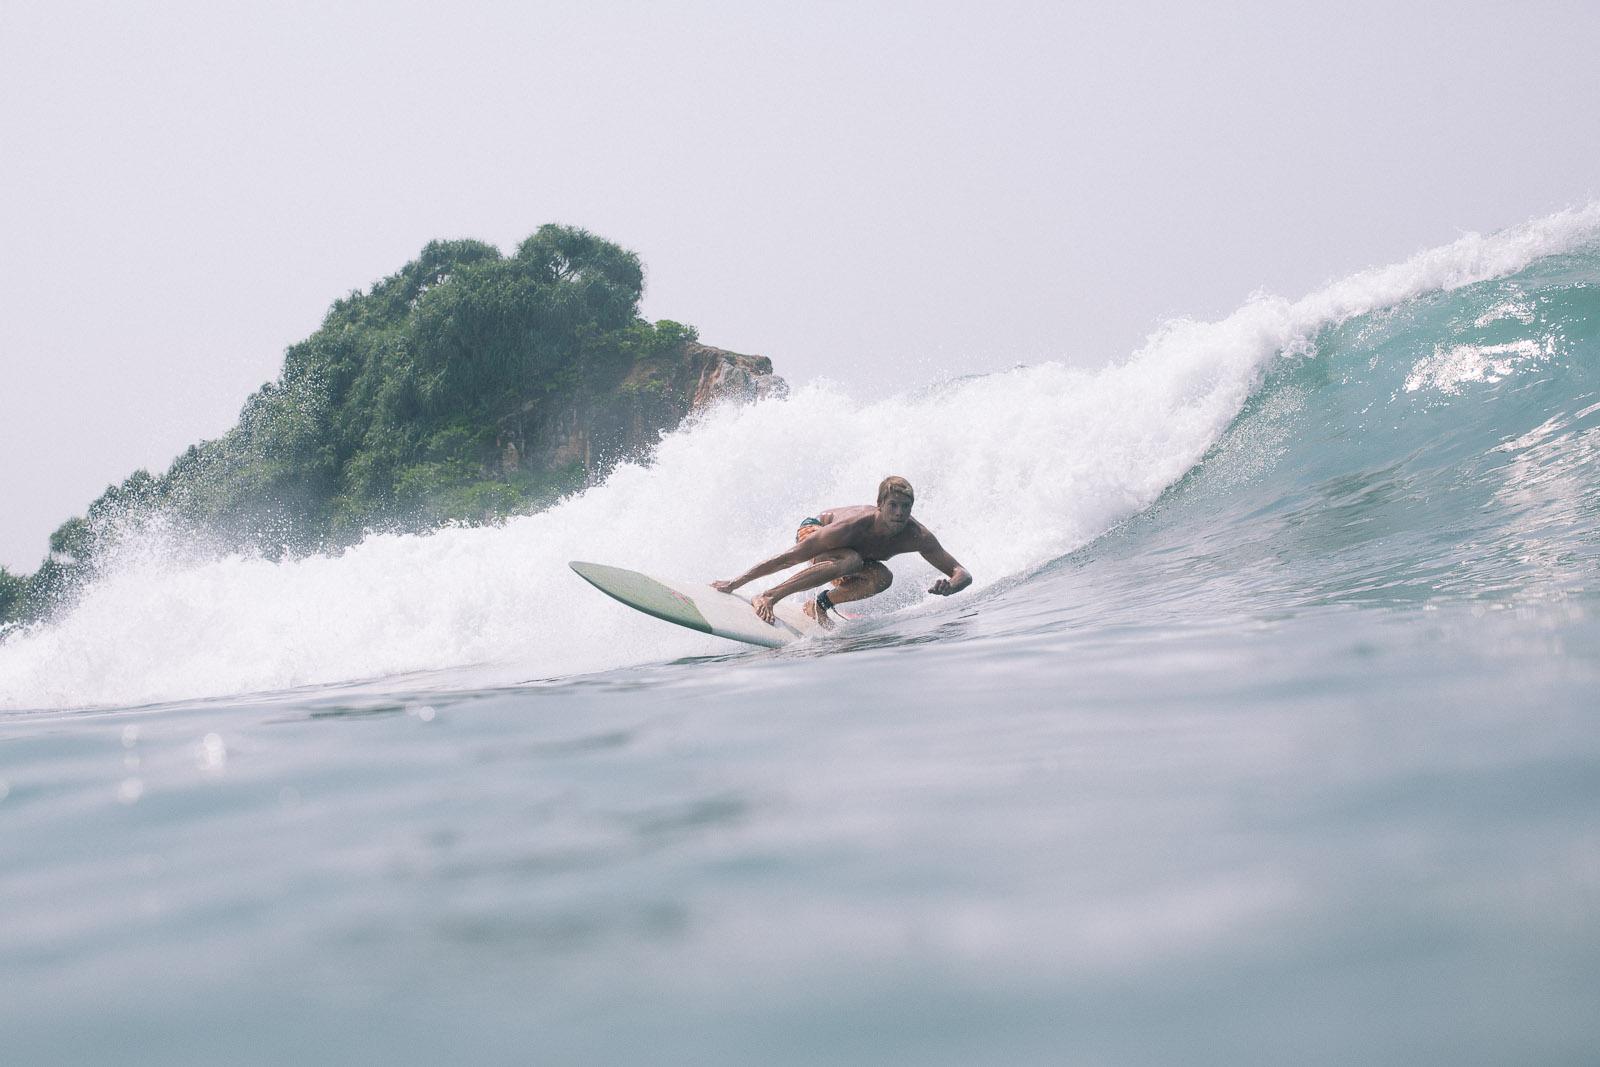 Sri Lanka-Hikkaduwa-Midigama-Aragum Bay-Sunshinestories-surf-travel-blog-M06A2116.jpg